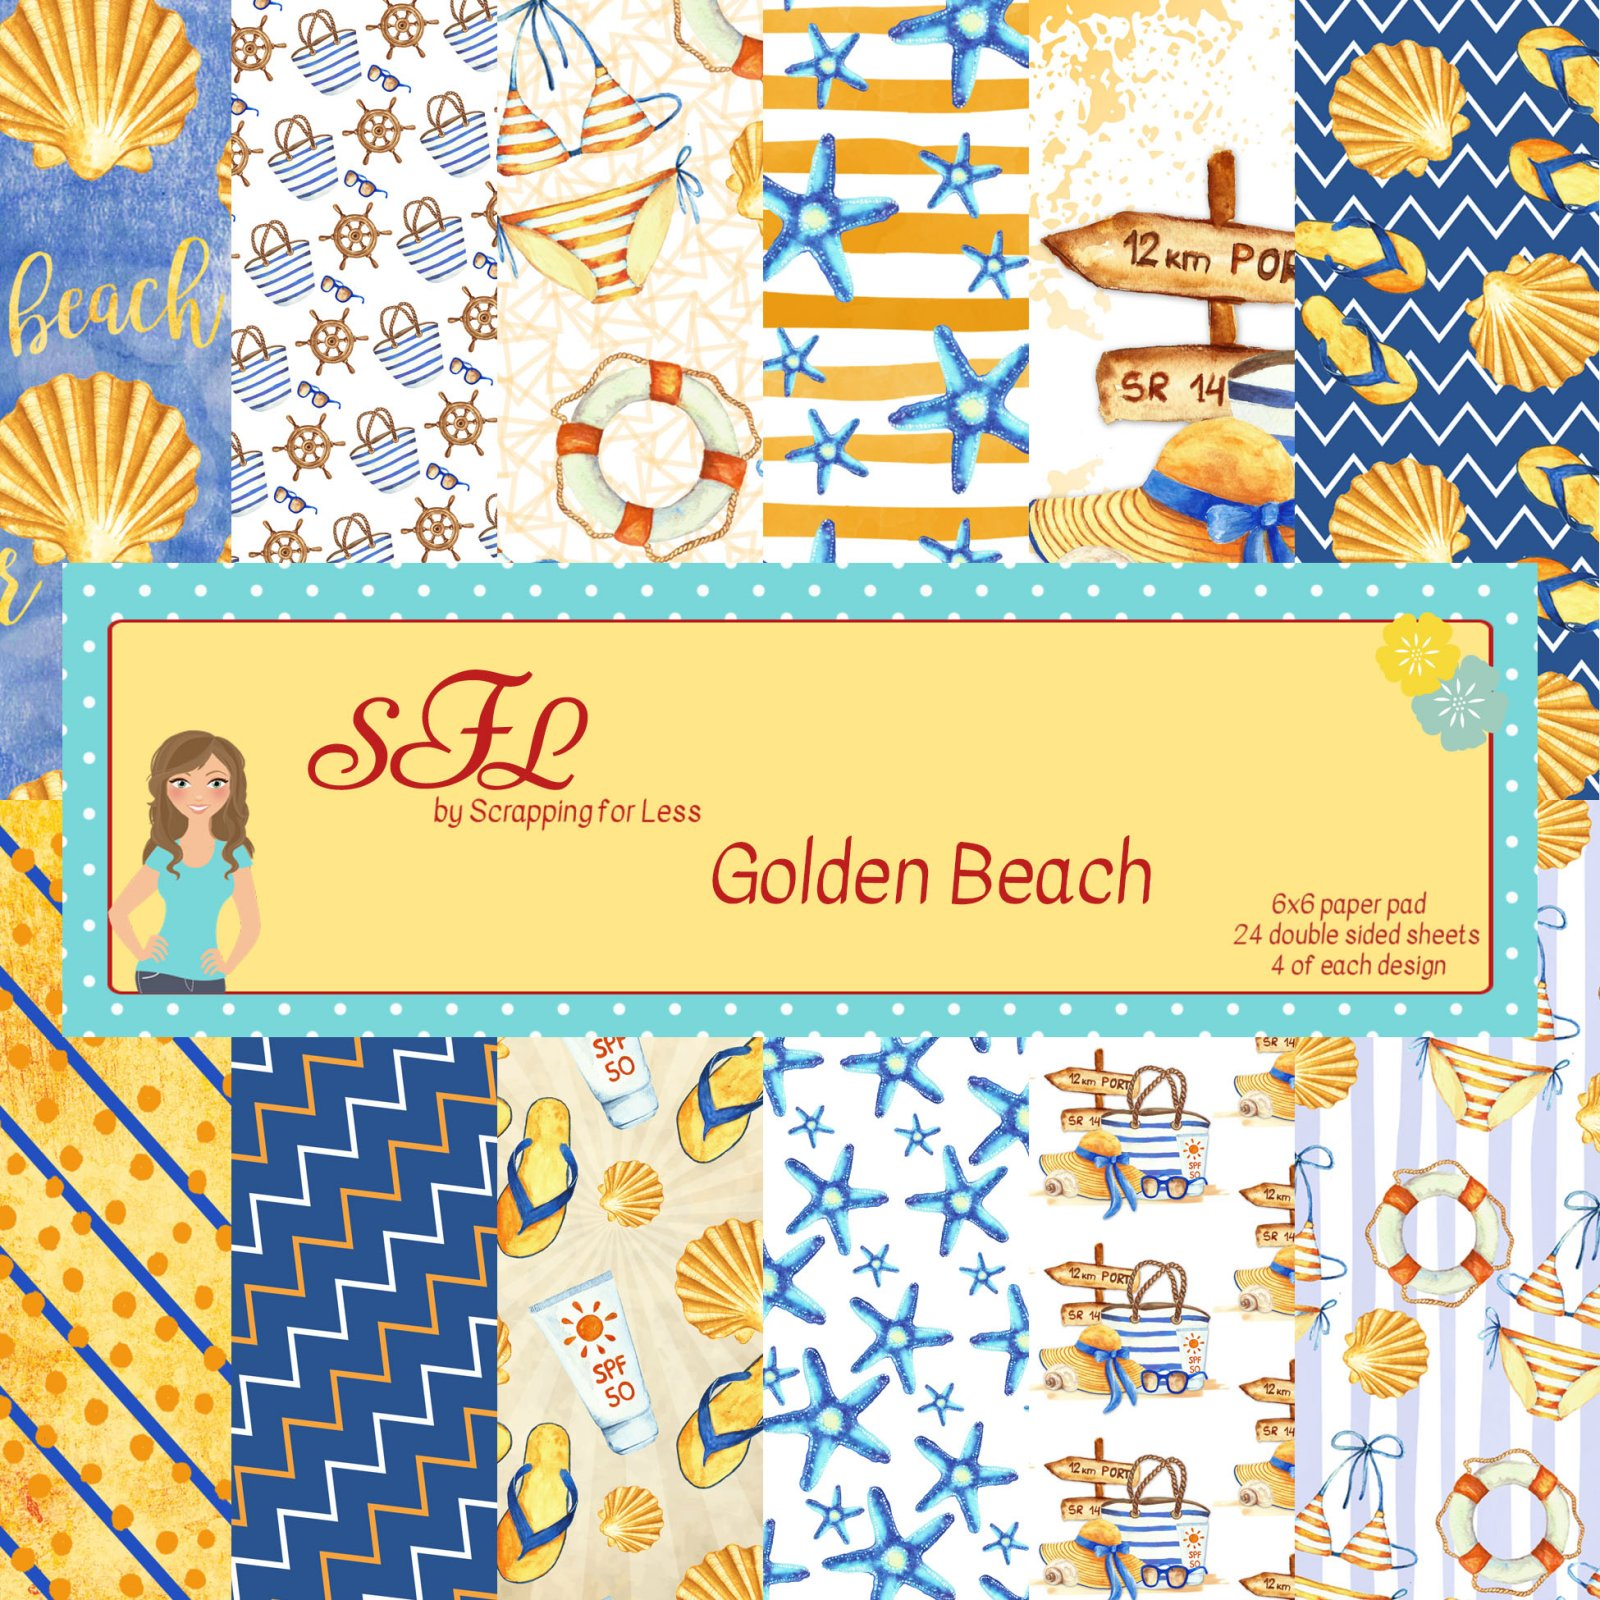 SFL Golden Beach 6x6 Paper Pad